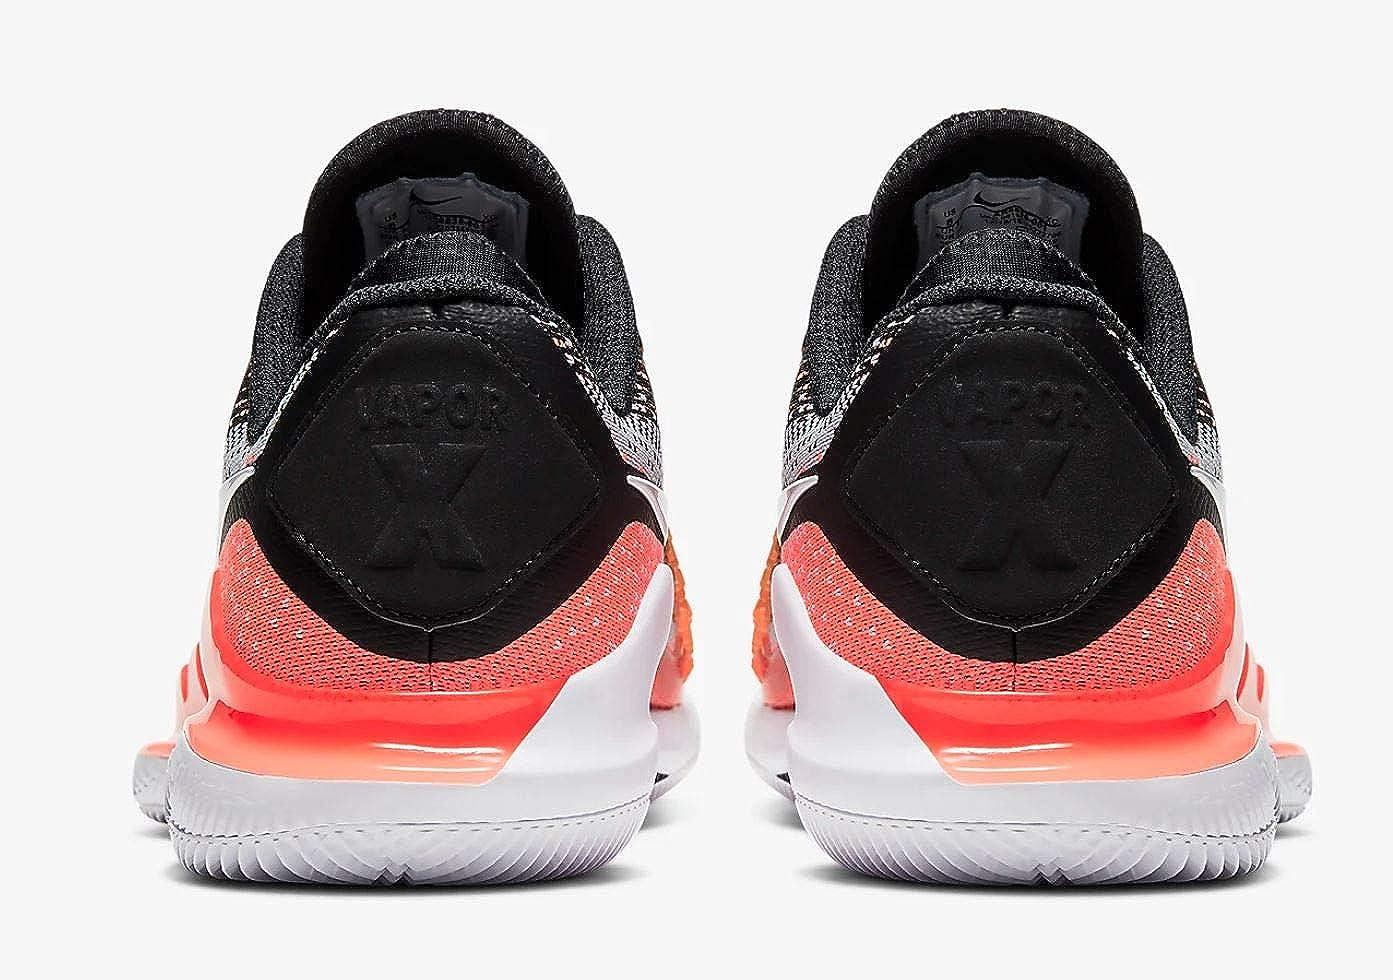 Nike Zoom Vapor X Knit HC Scarpe da Tennis Donna BlackWhite